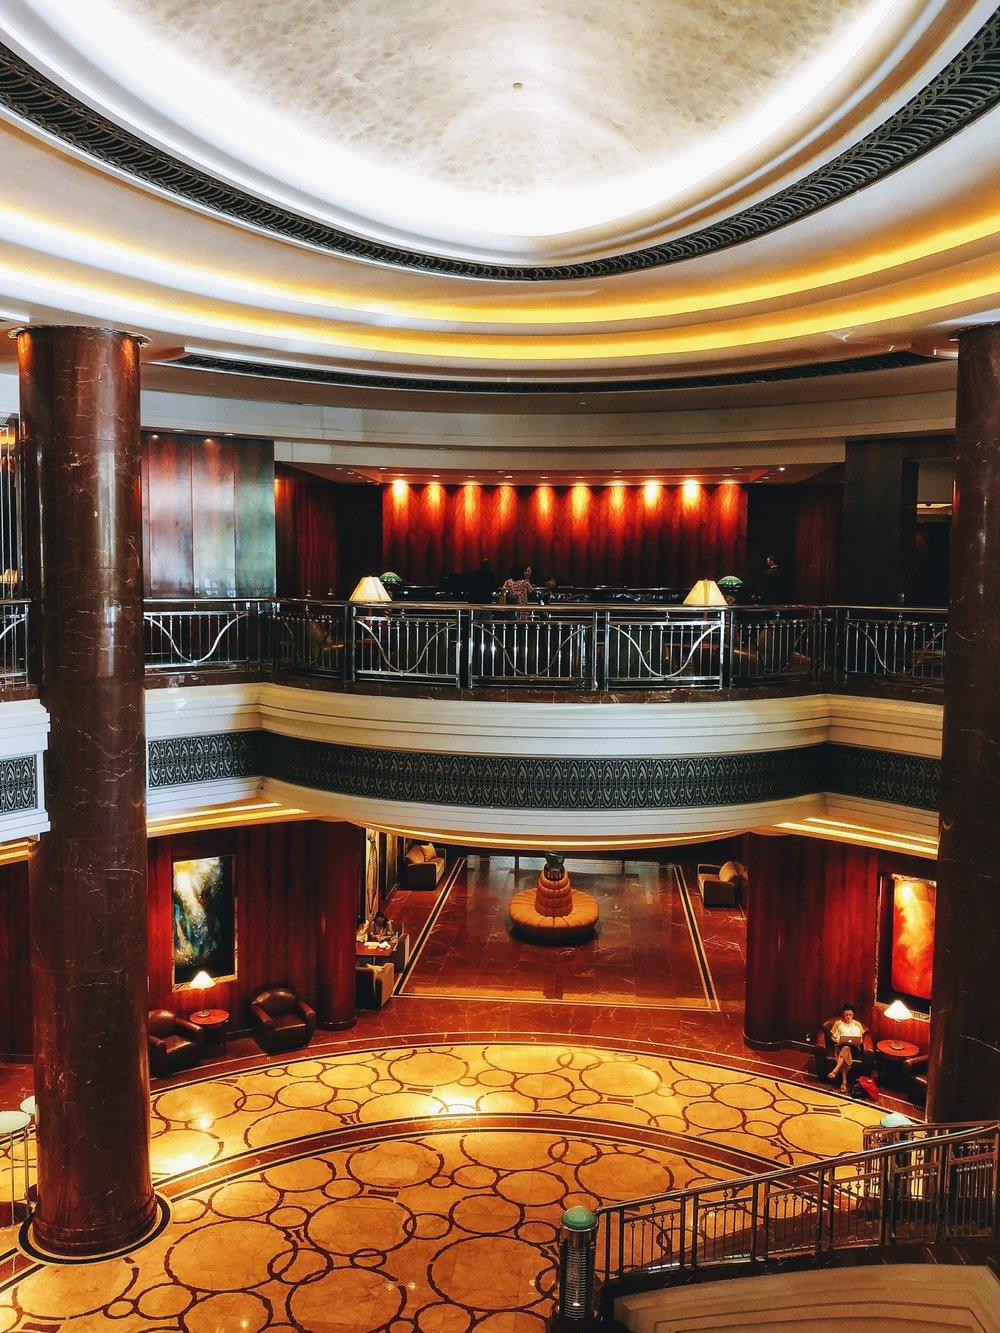 What a grand lobby!